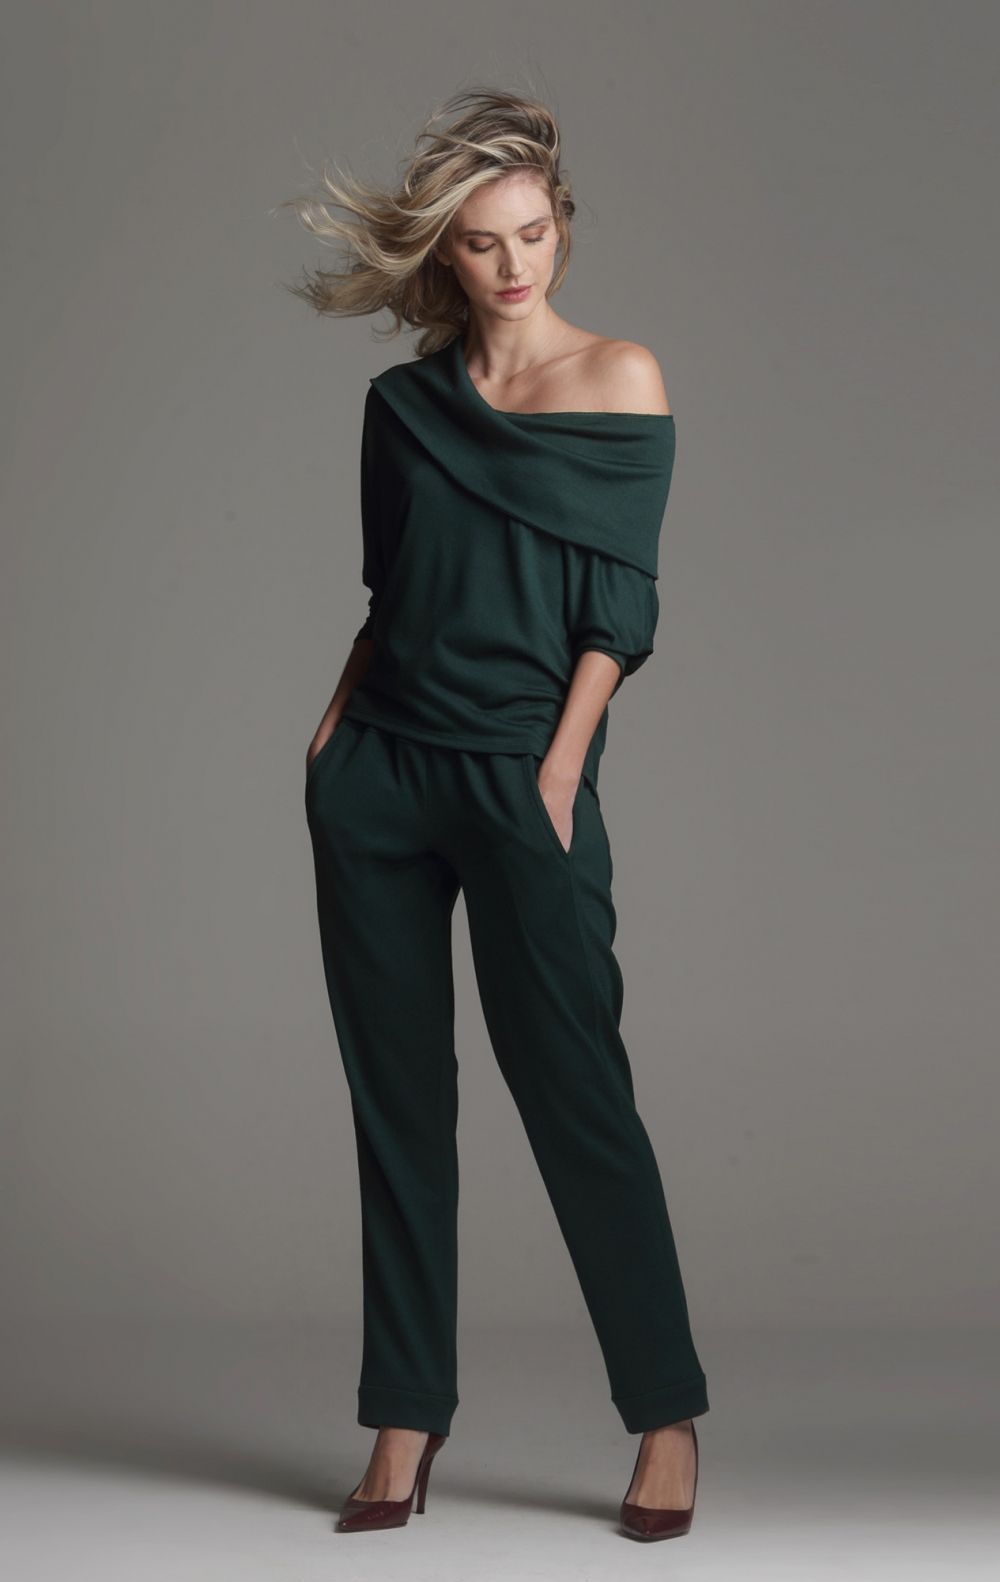 Blusa Malha Ombro a Ombro Verde - Foto 1